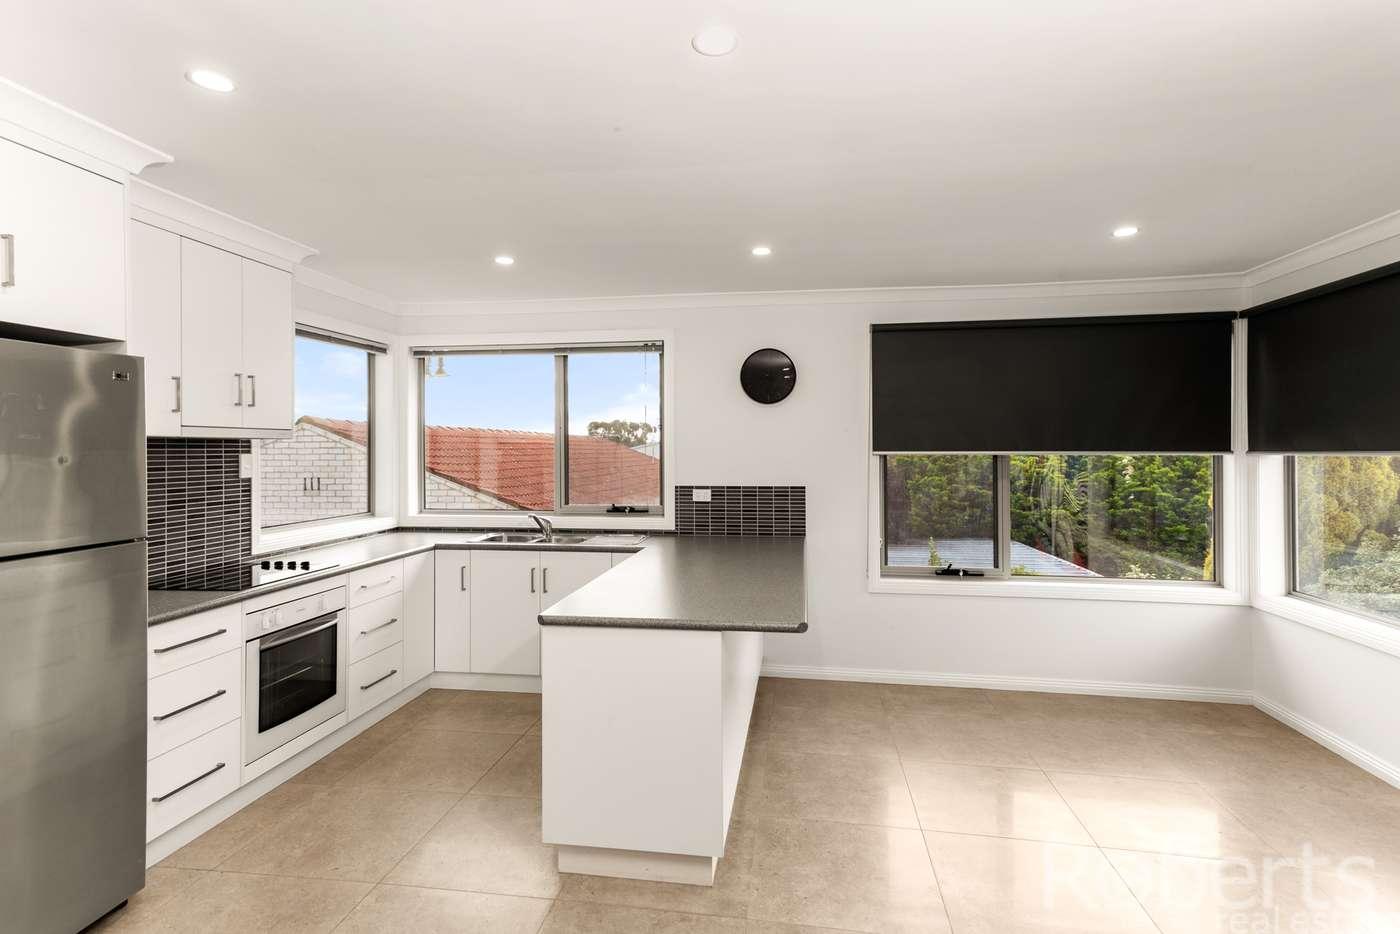 Main view of Homely house listing, 31 Henrietta Grove, West Launceston TAS 7250